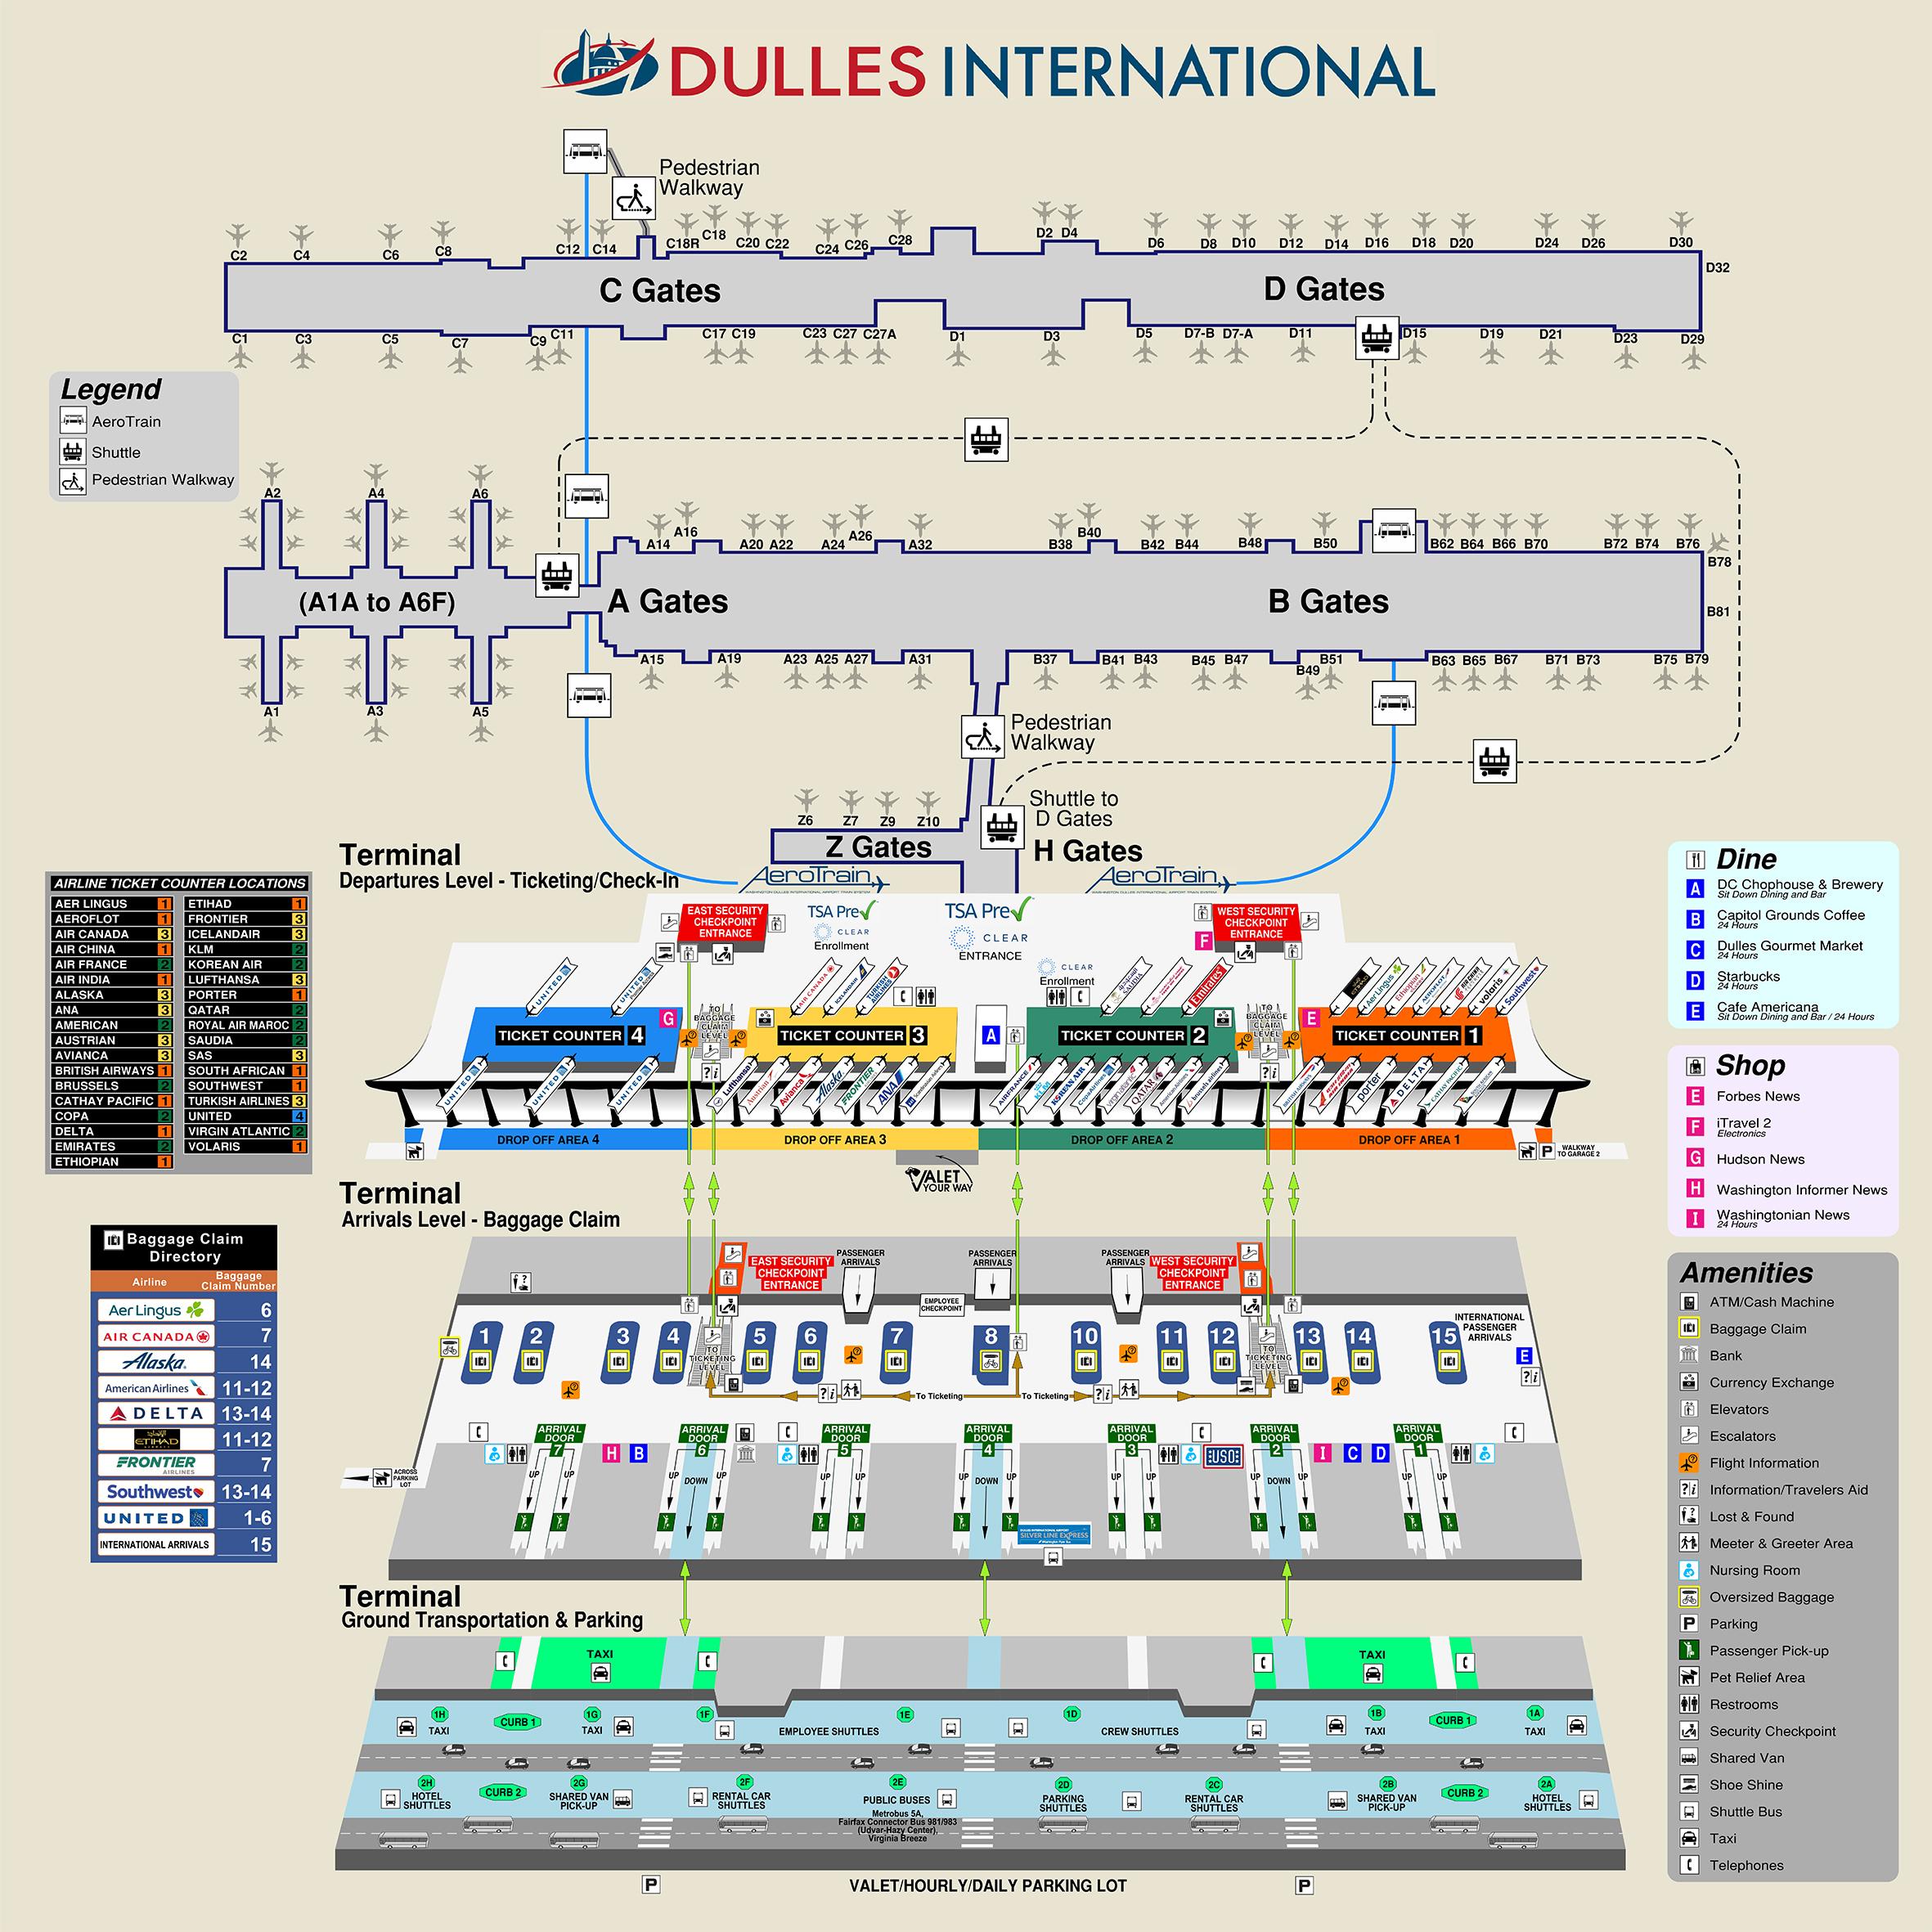 Dulles Airport Map (IAD) - Printable Terminal Maps, Shops ...